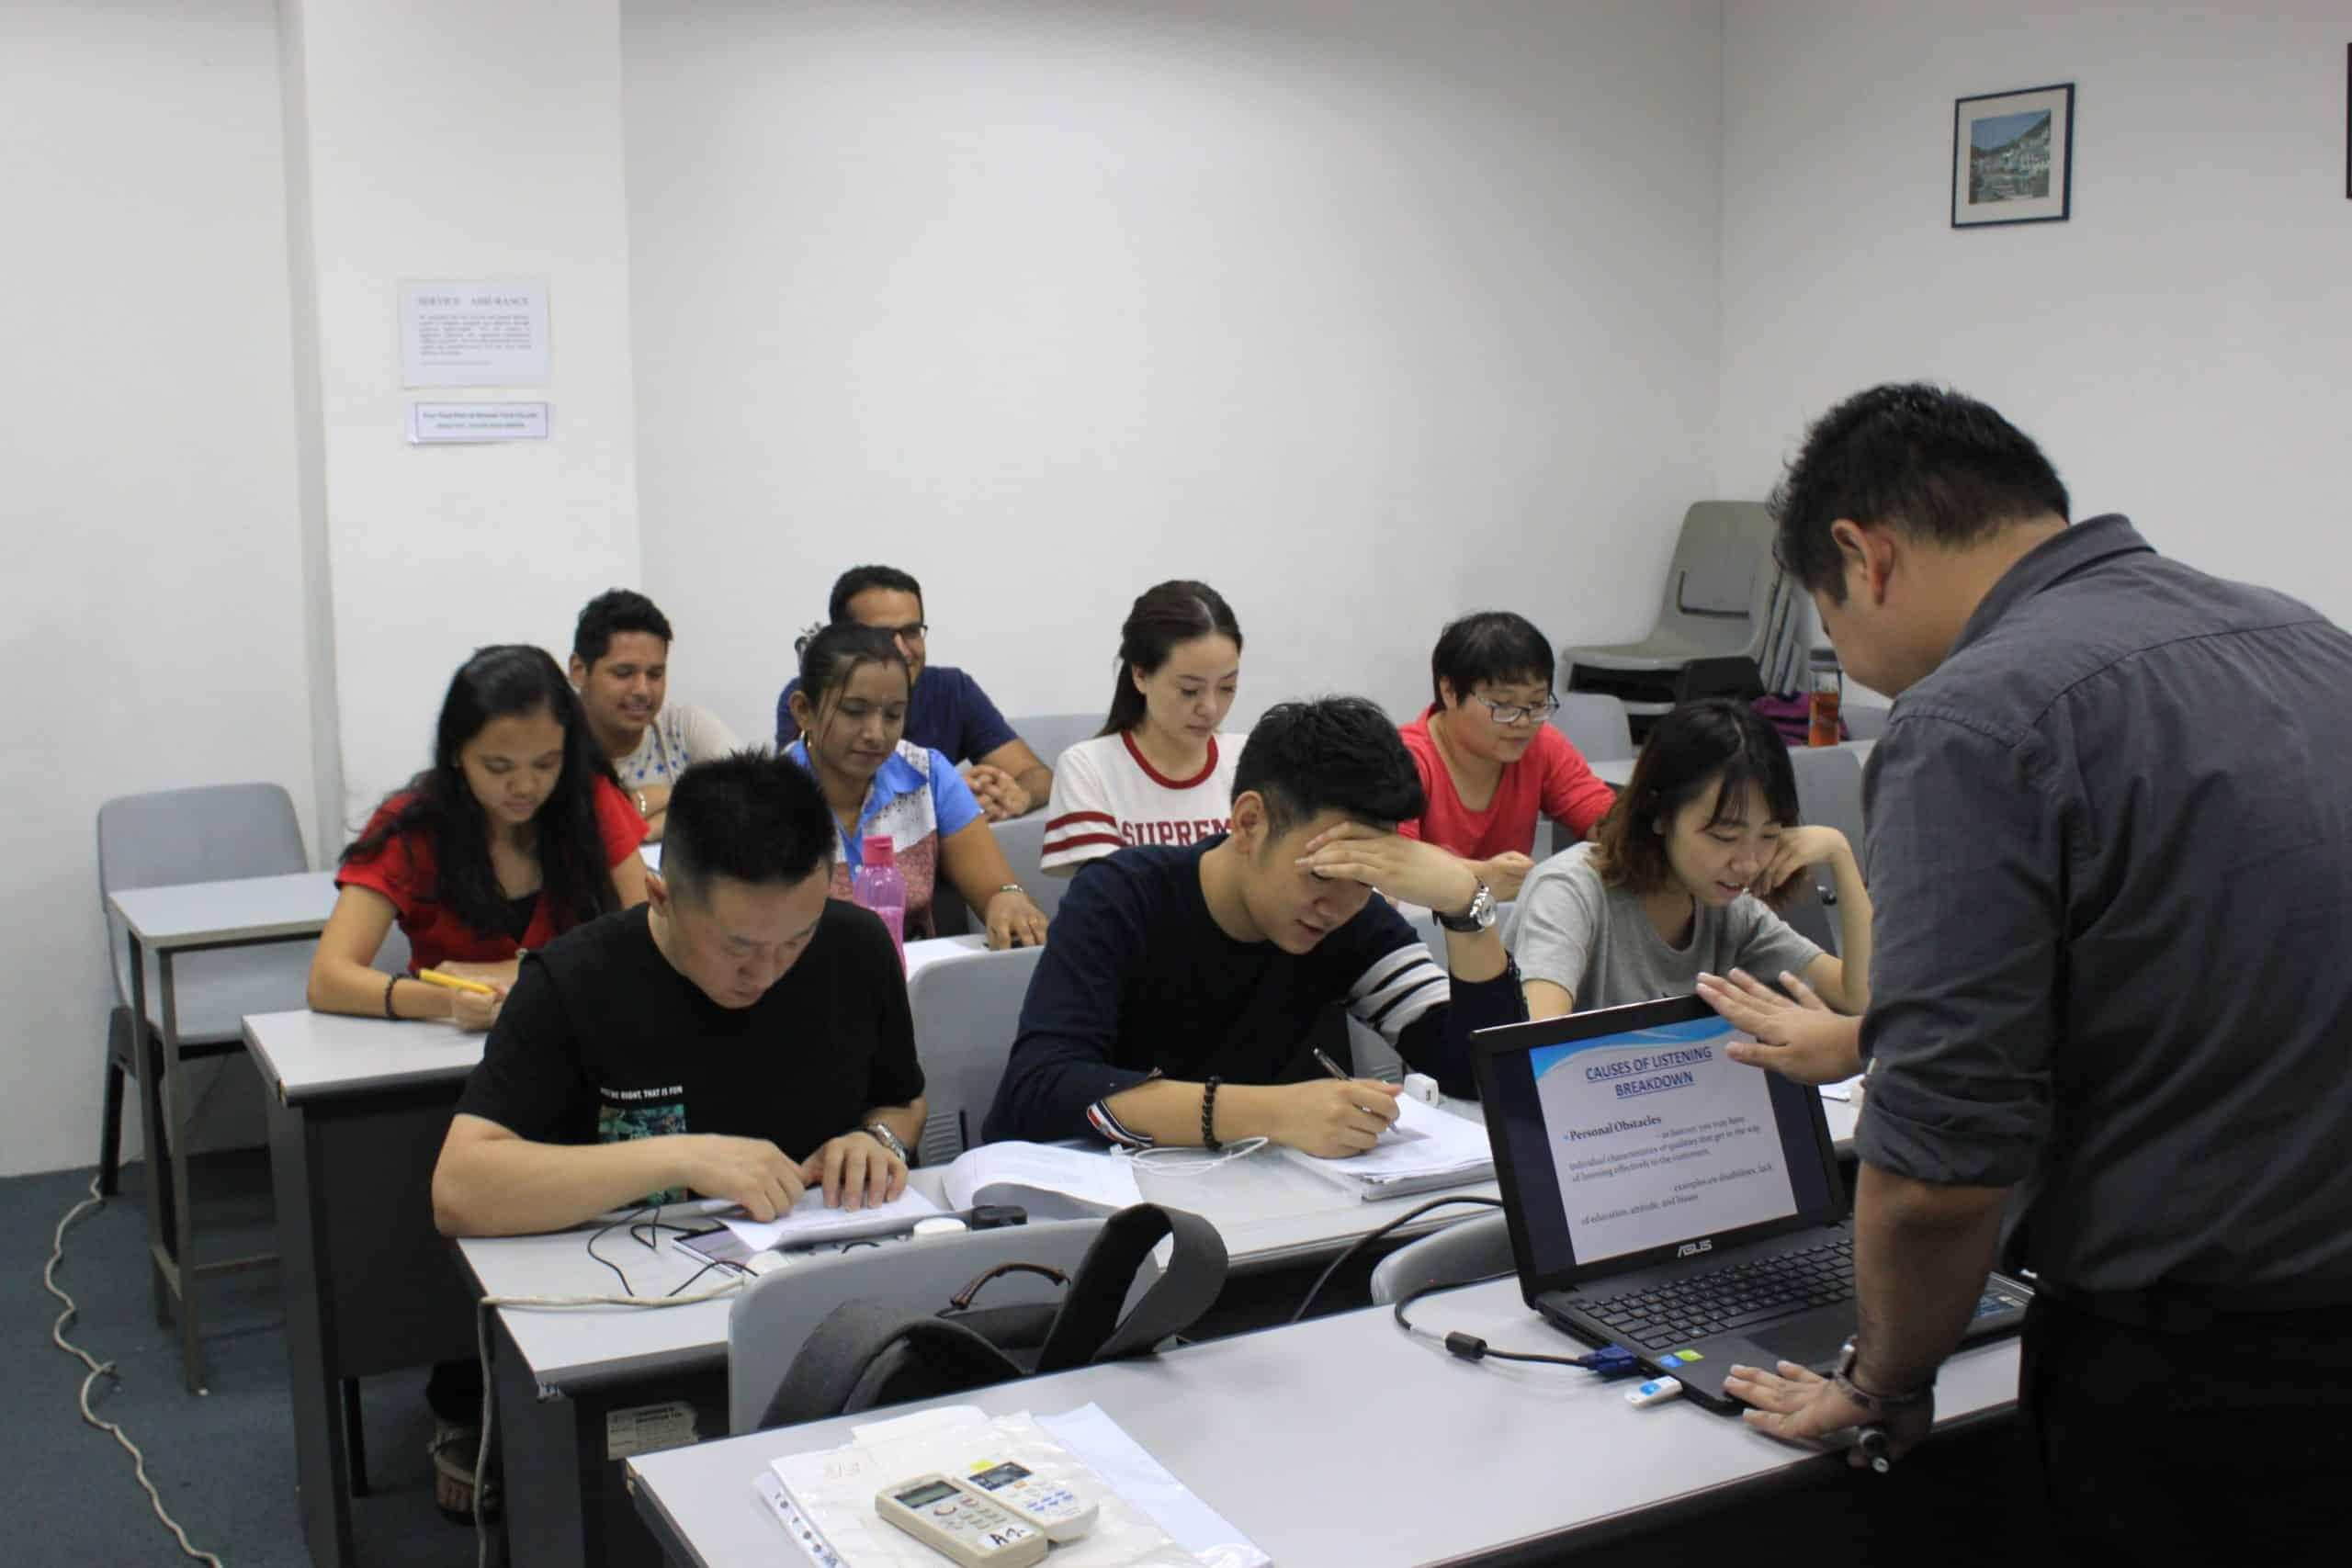 English Conversation and Writing Skills Intermediate Level 1 & 2